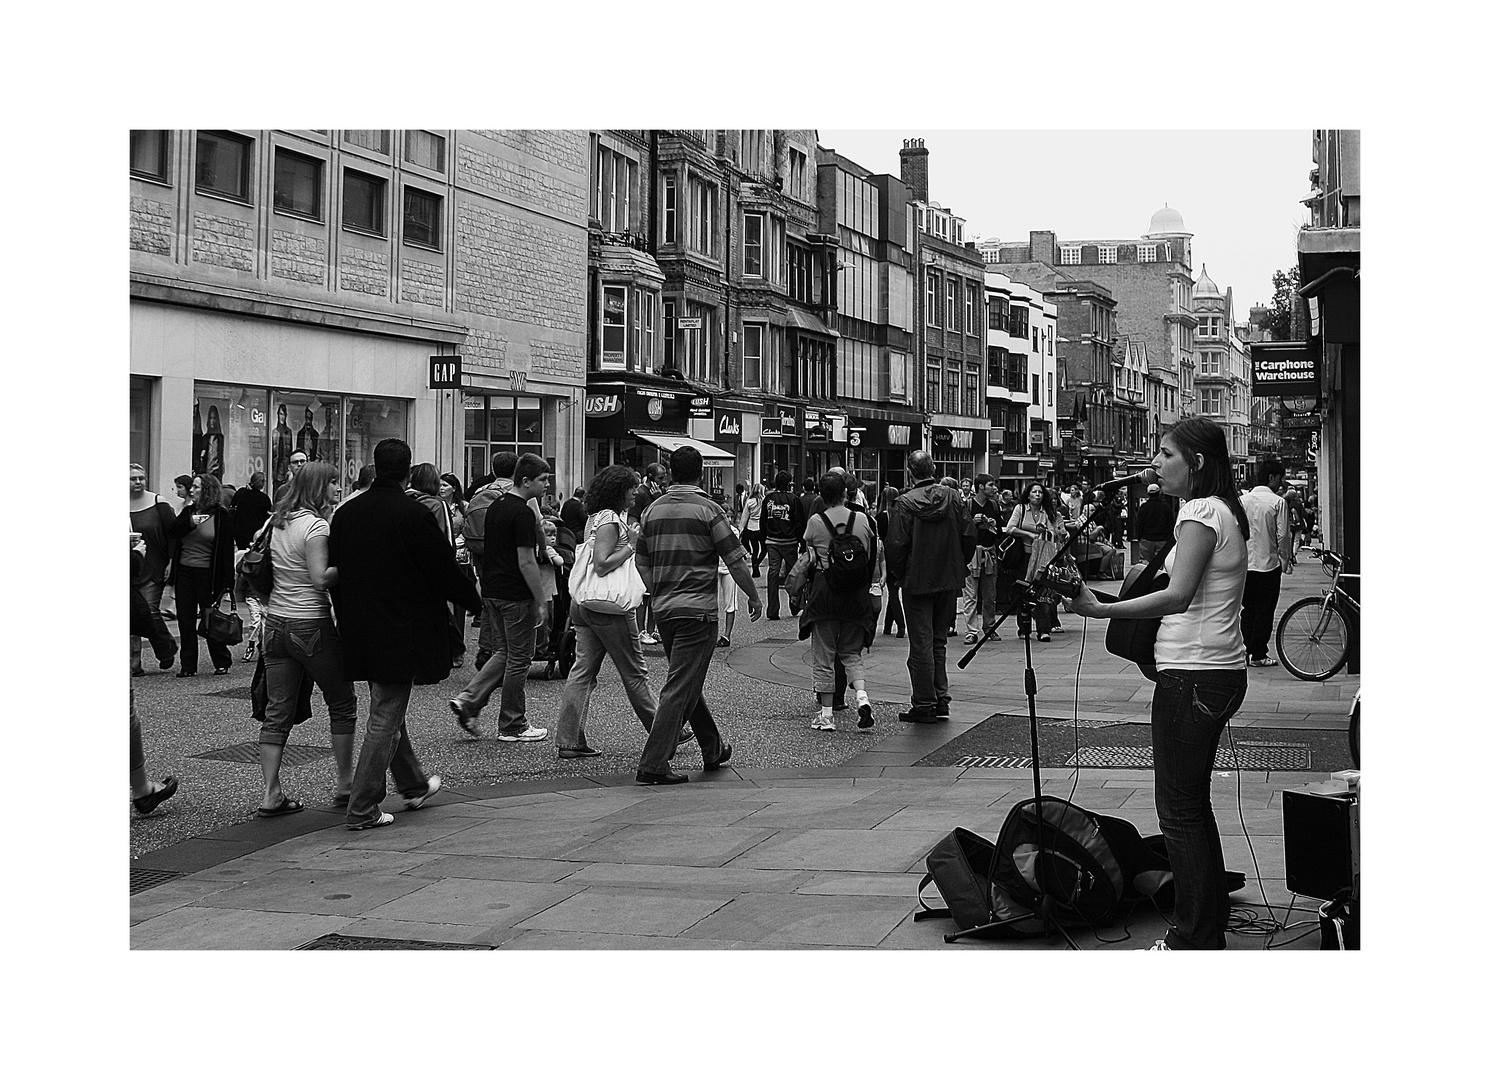 Fußgängerzone Oxford